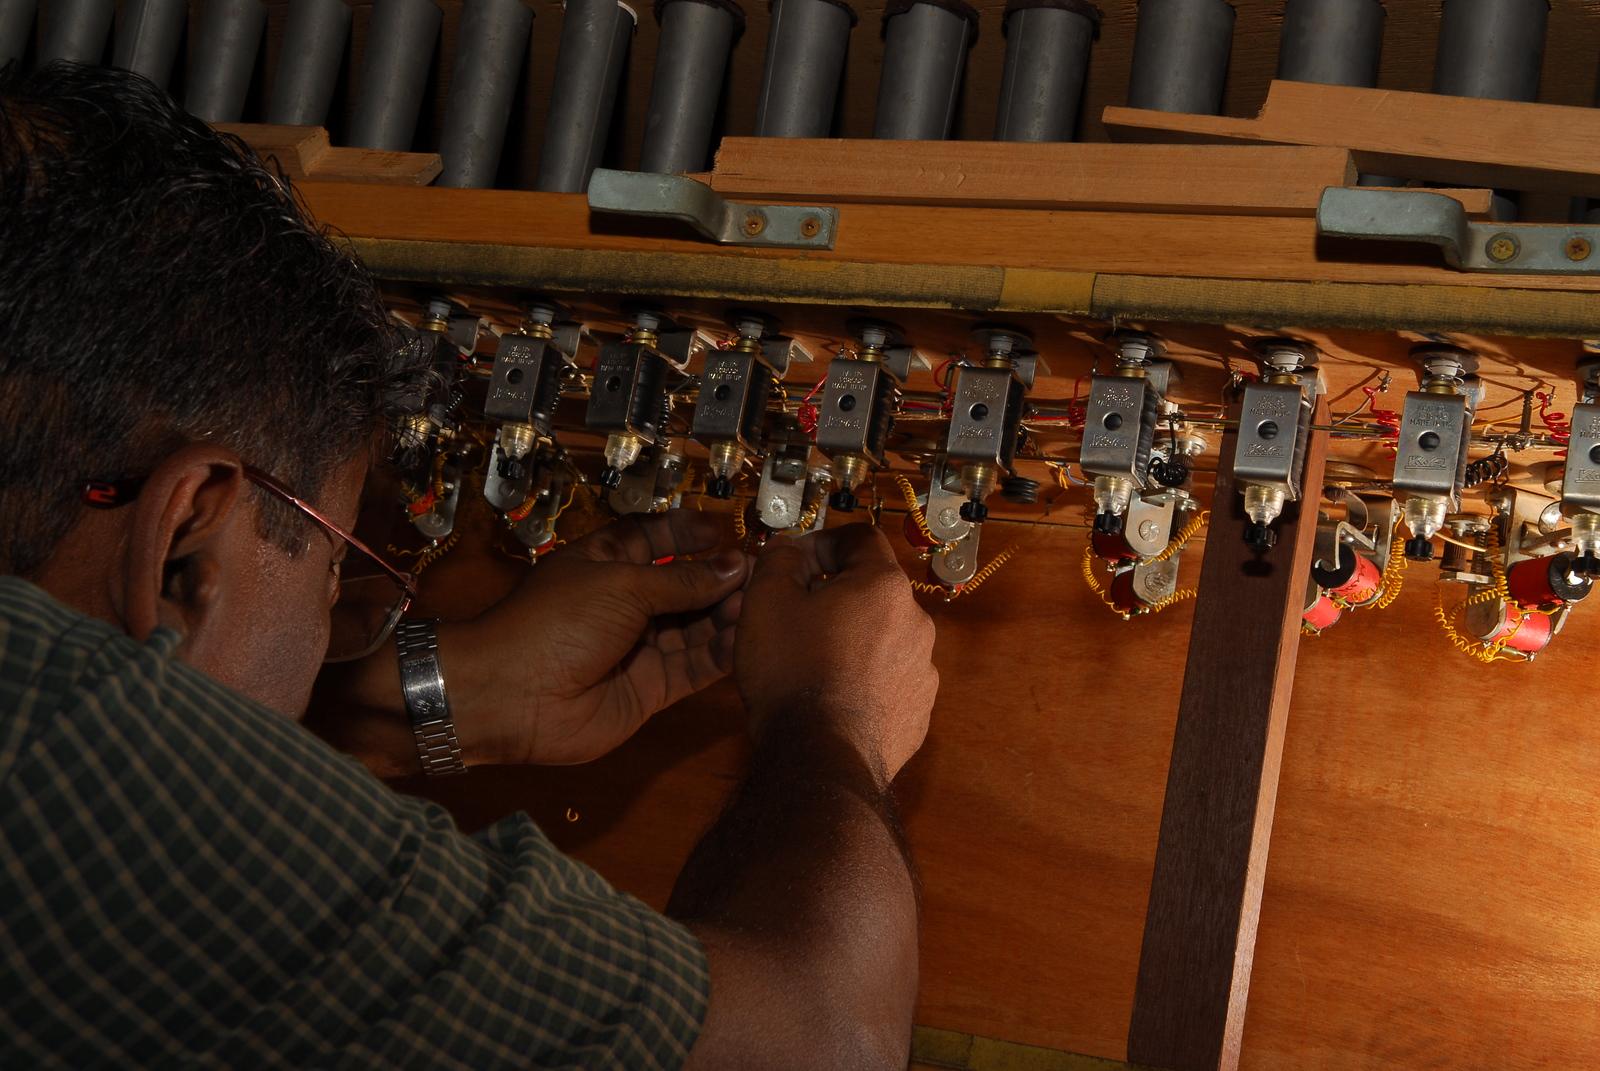 Cathedral of the Good Shepherd Bevington Organ electro-pneumatic action Robert Navaratnam